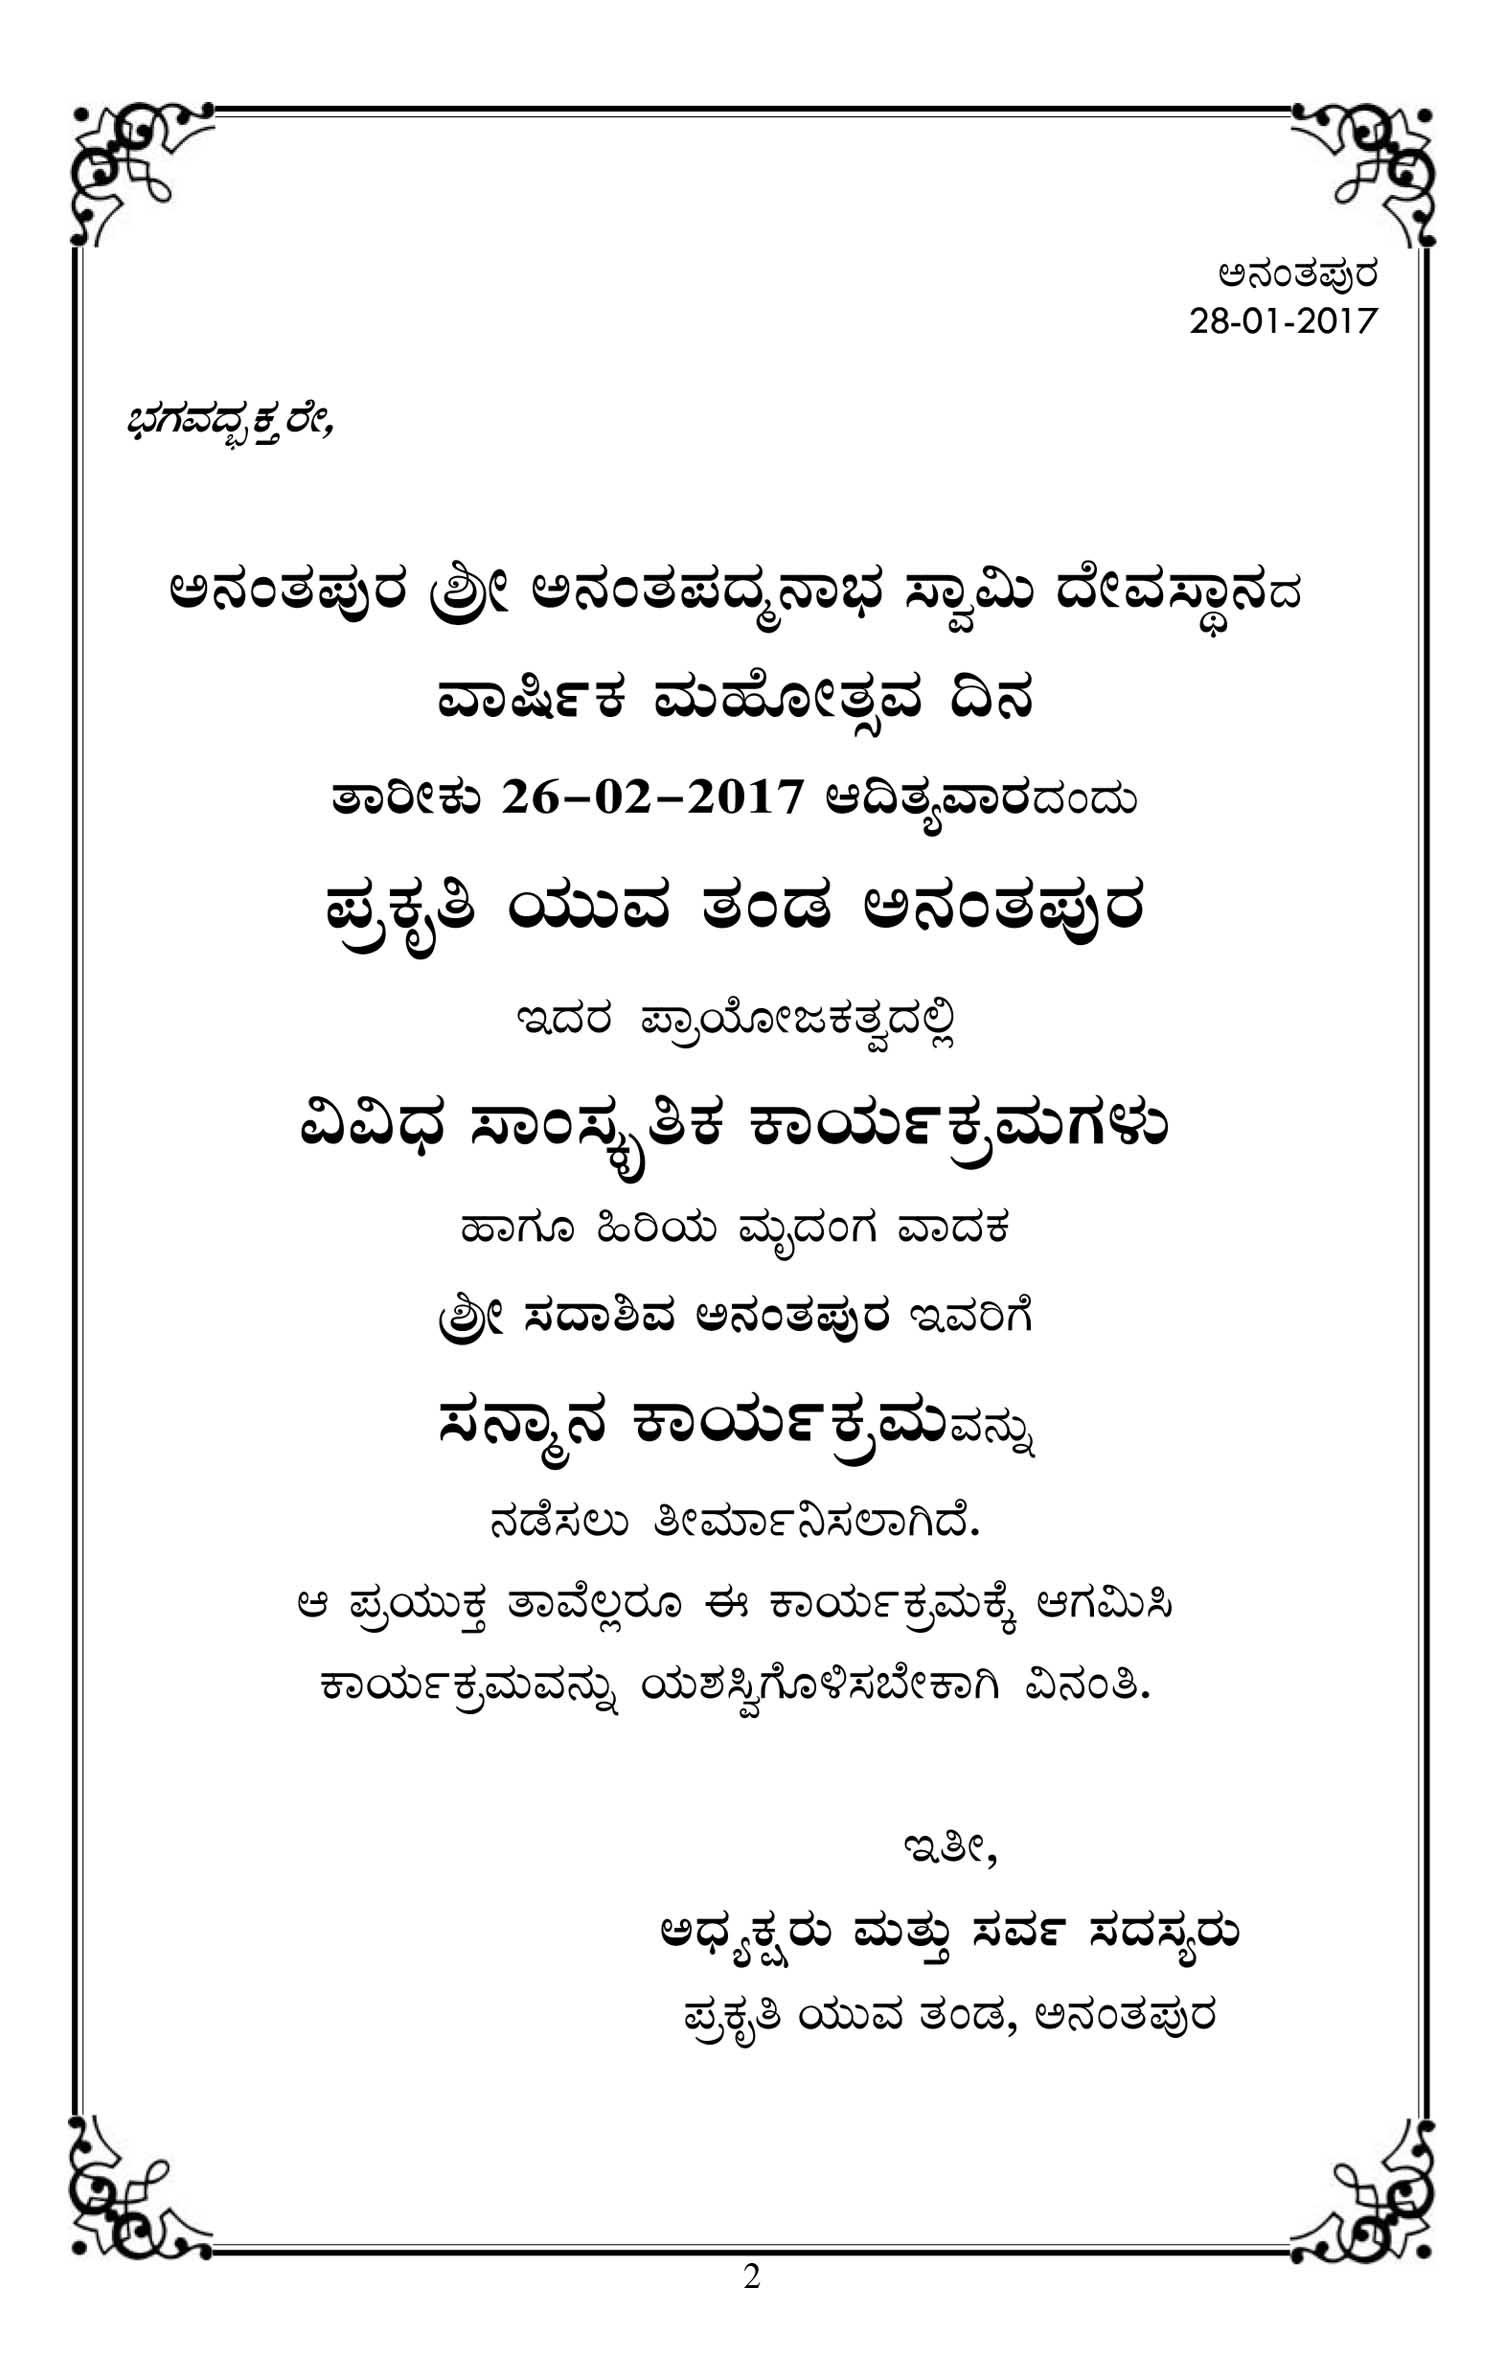 Prakrithi Yuva Thanda Cultural Programs 26-2-2017 2